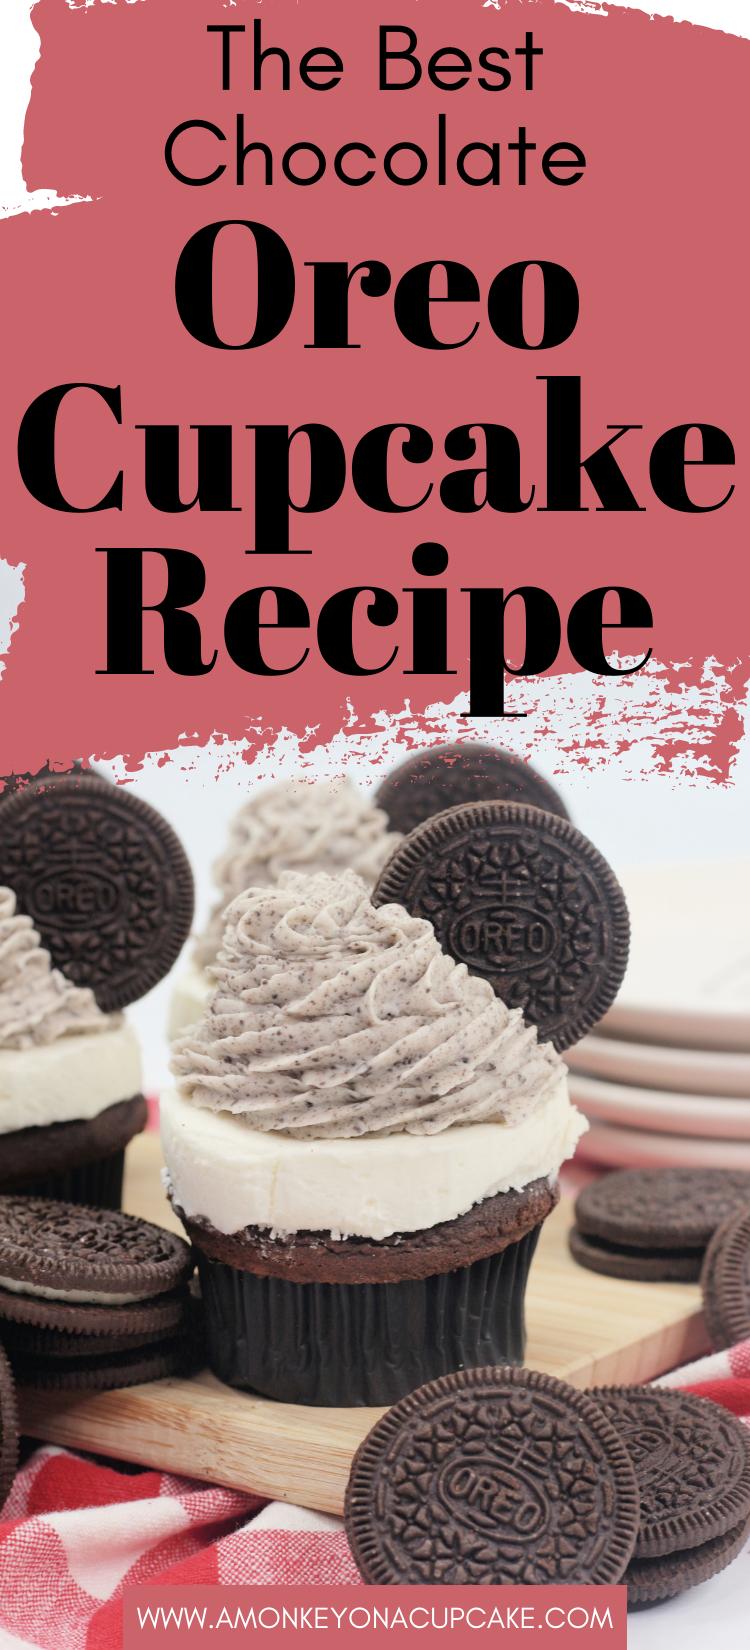 The Most Amazing Chocolate Oreo Cupcake Recipe